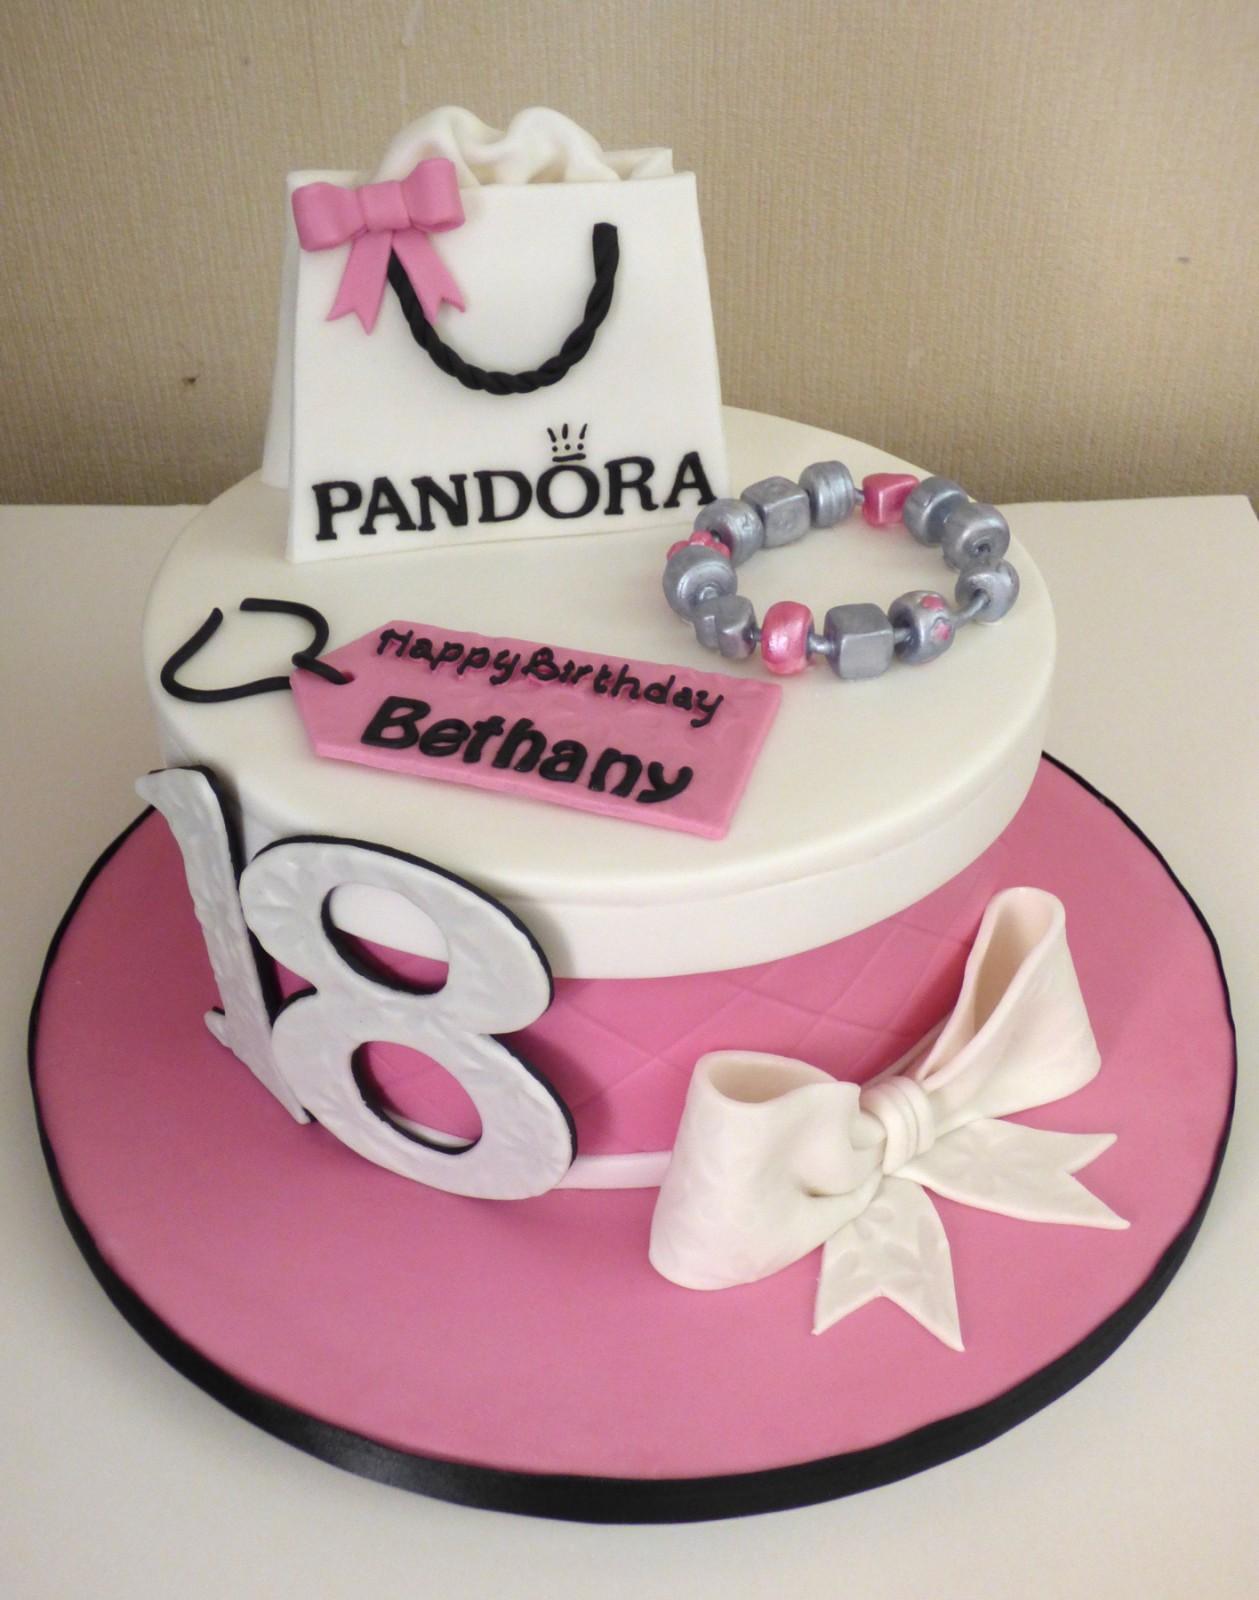 Astonishing Pandora Bag And Charm Bracelet 18Th Birthday Cake Susies Cakes Birthday Cards Printable Opercafe Filternl